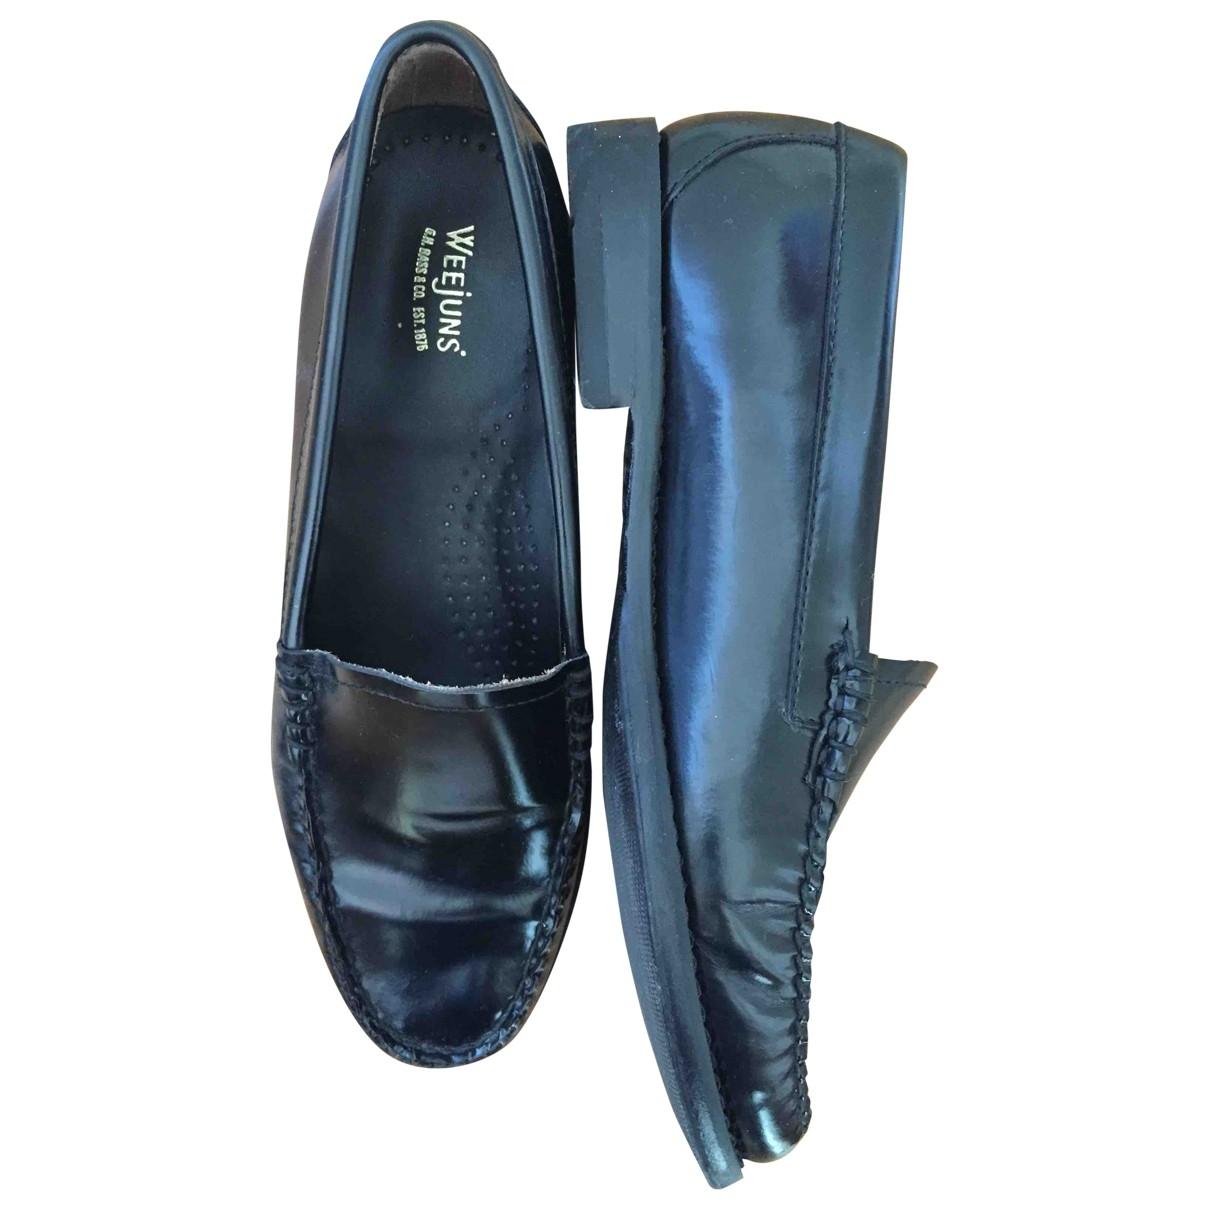 Bass Weejun \N Black Leather Flats for Women 5 UK